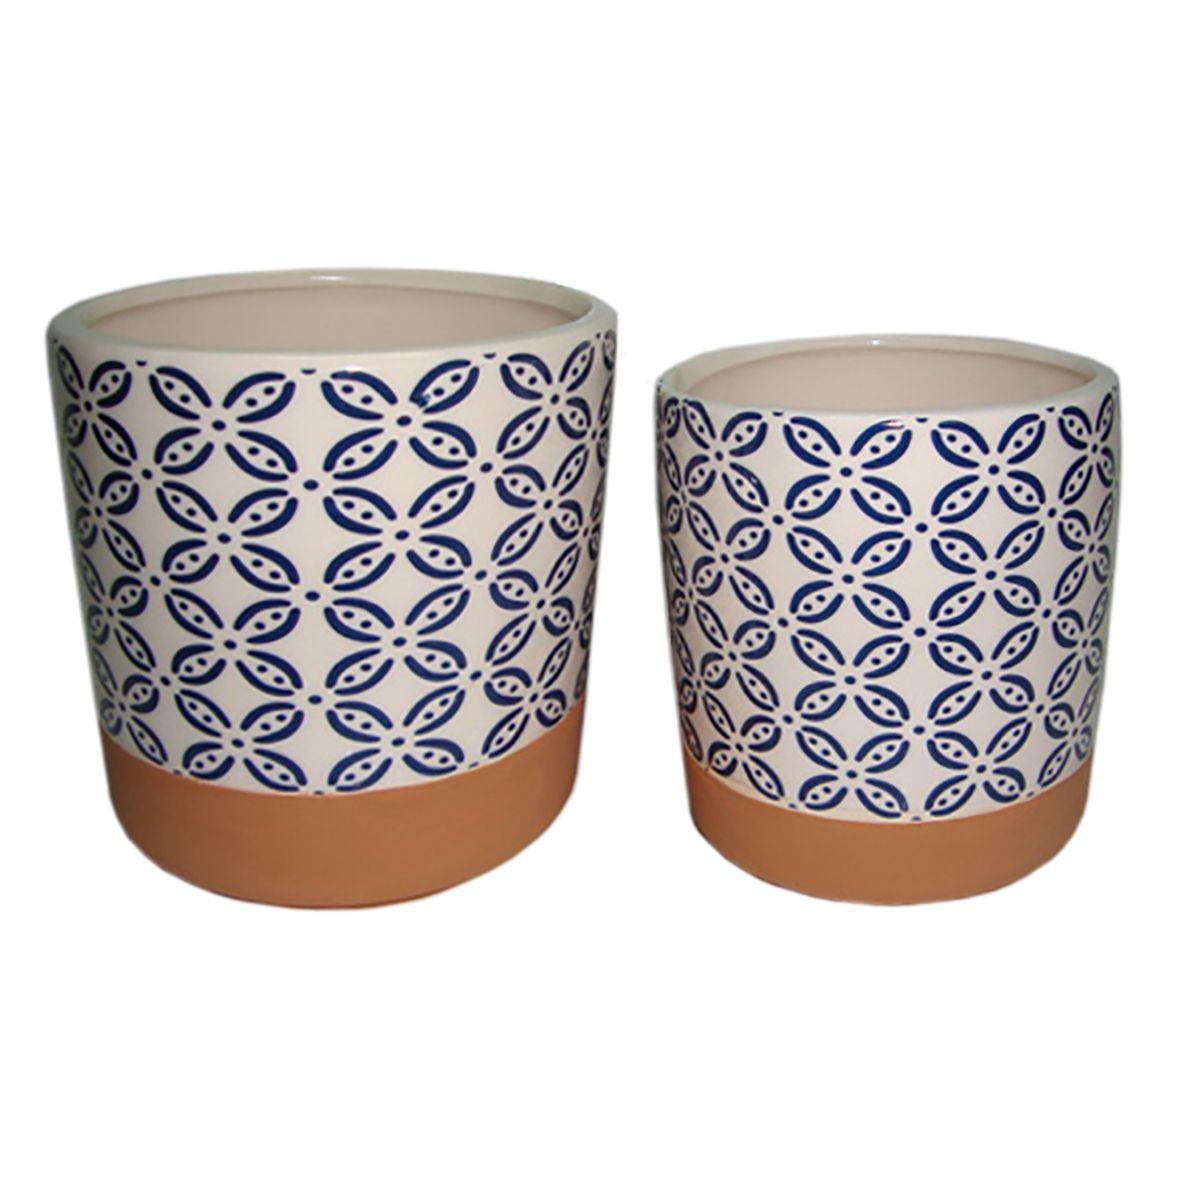 Conjunto de Cachepots de Cerâmica Terracota e Azul (2 Peças)